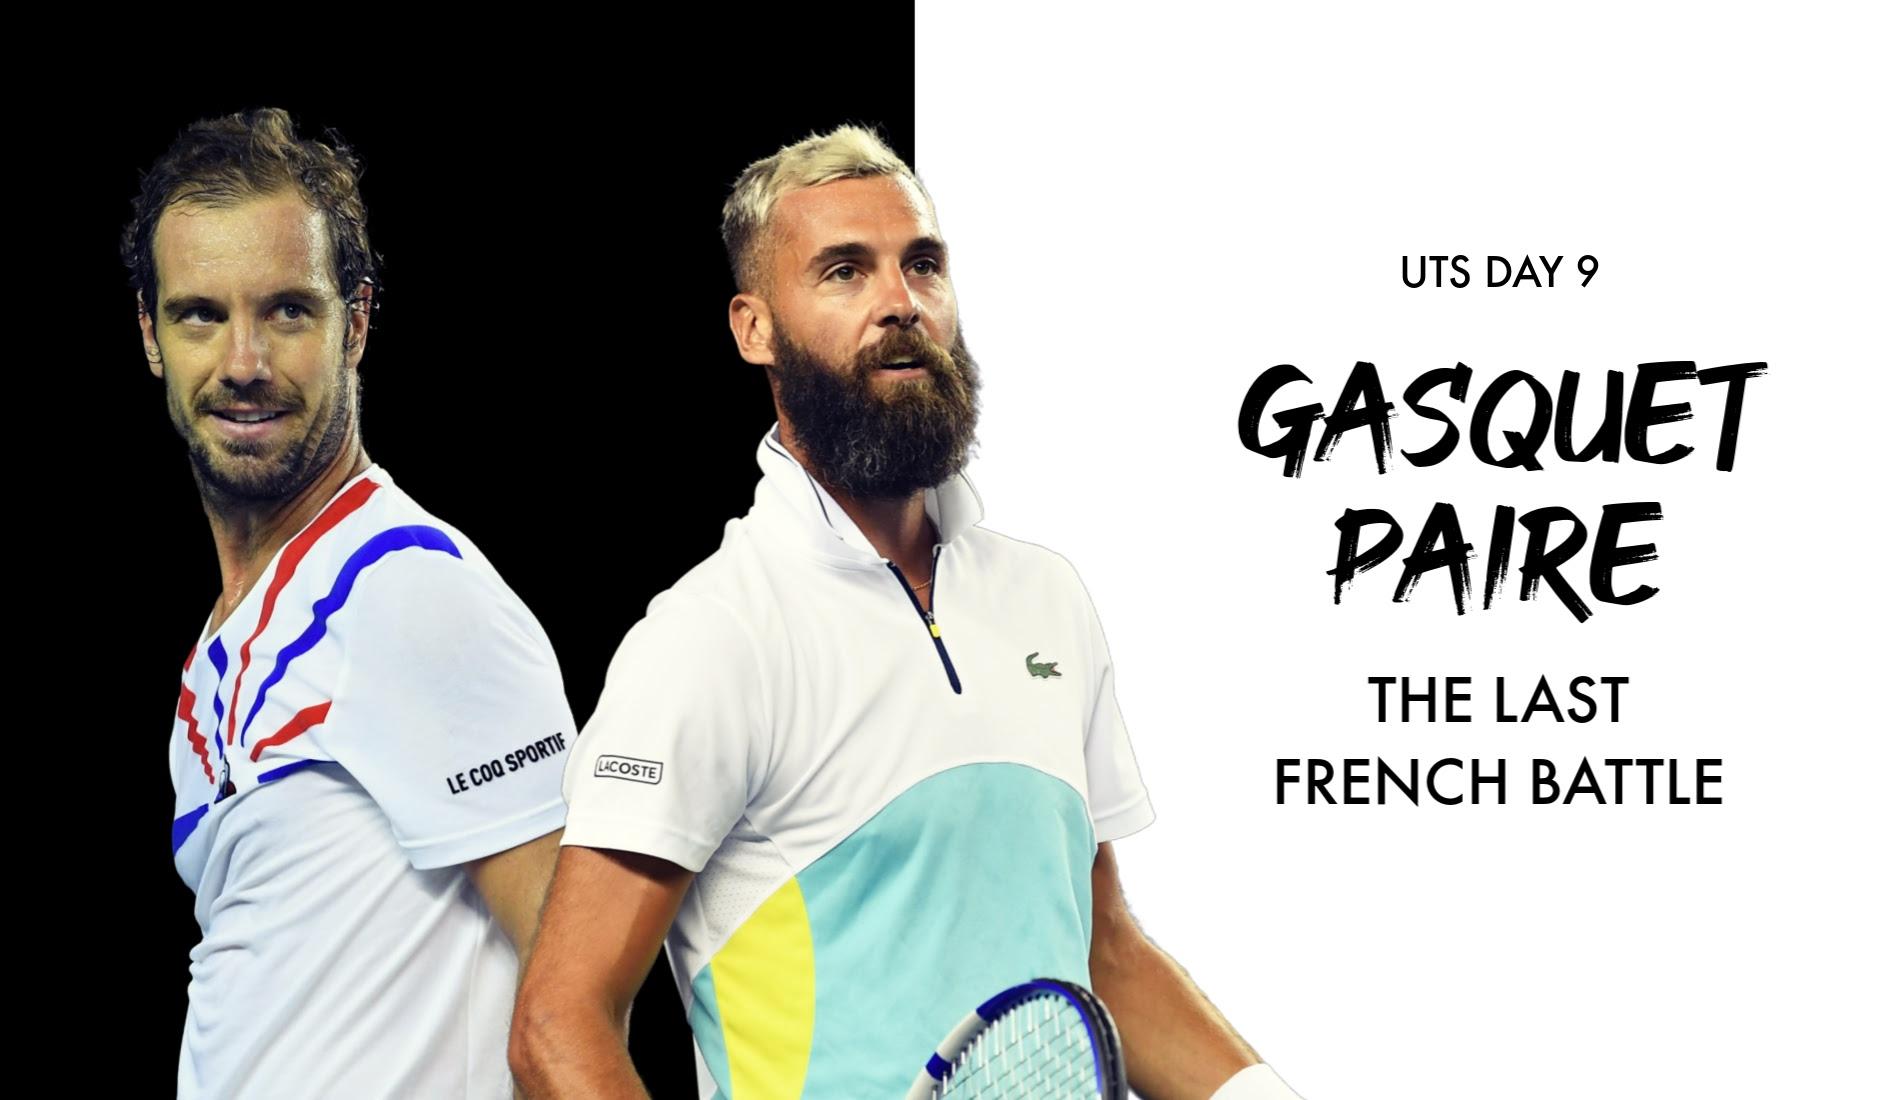 Richard Gasquet and Benoit Paire meet again at UTS on Sunday